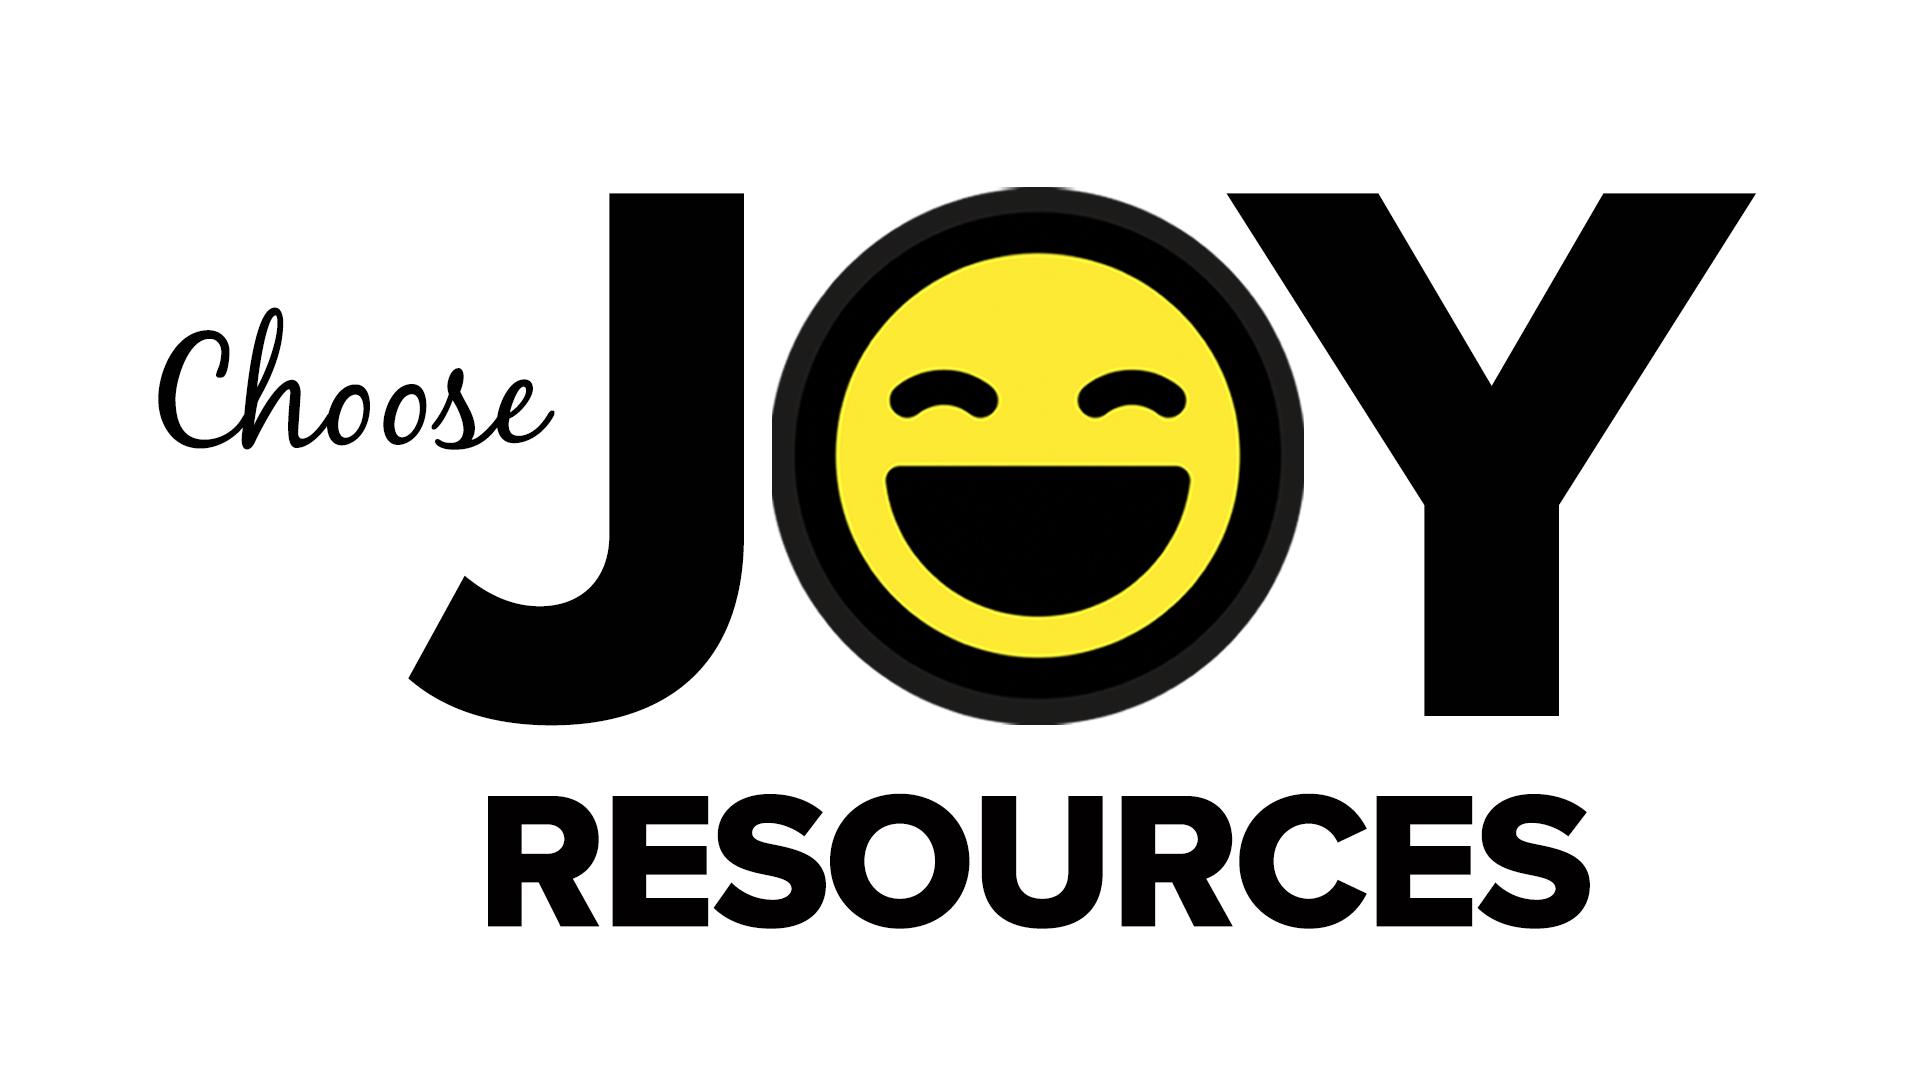 CHOOSE JOY RESOURCES.png